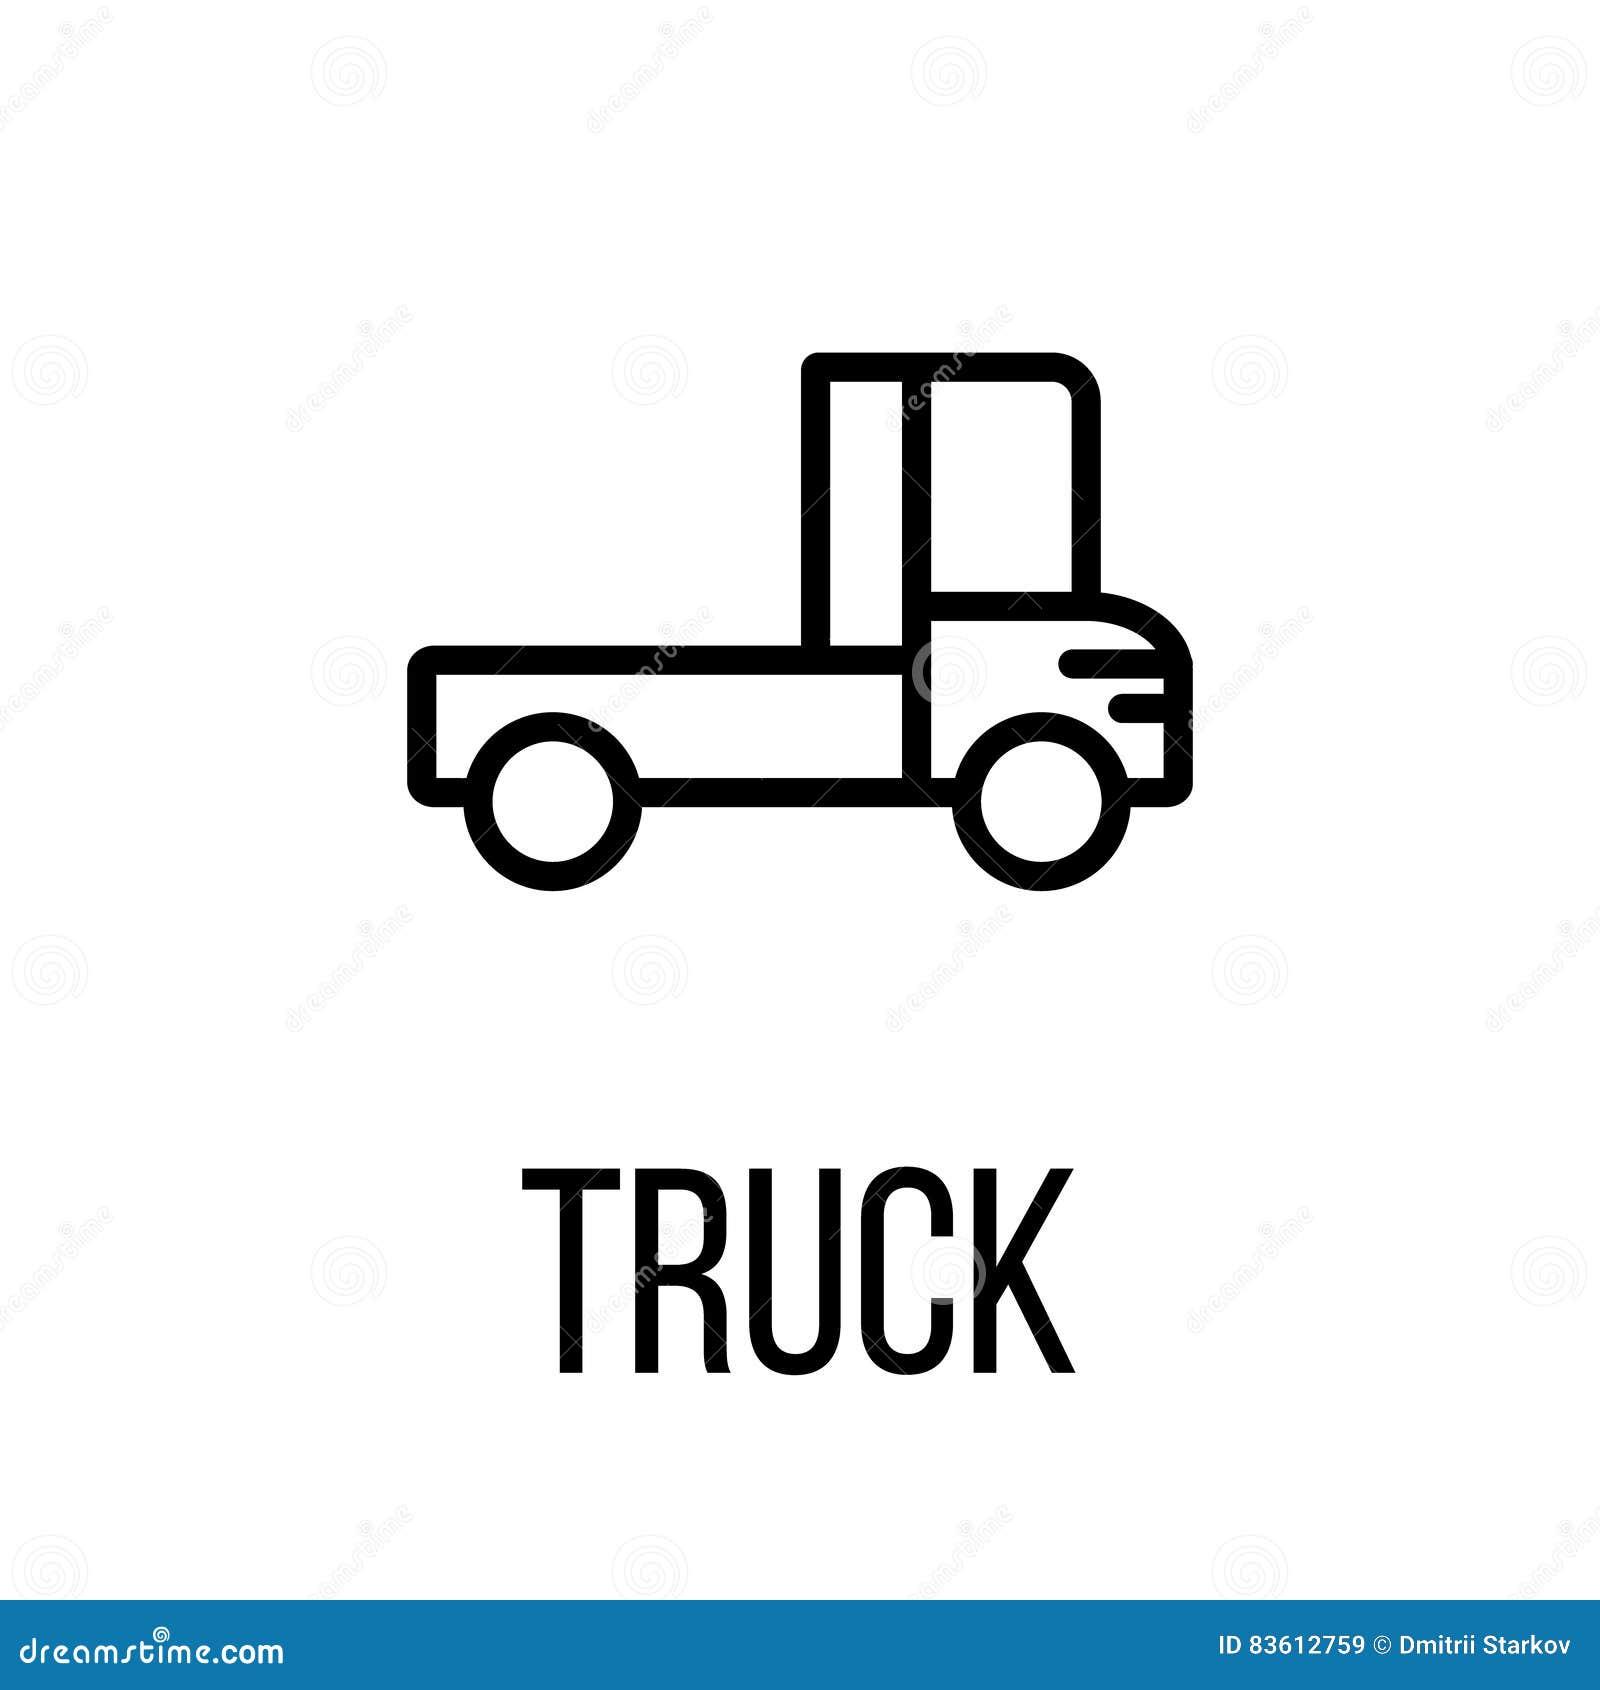 Truck logo icon cartoon vector 28080723 for Truck design app